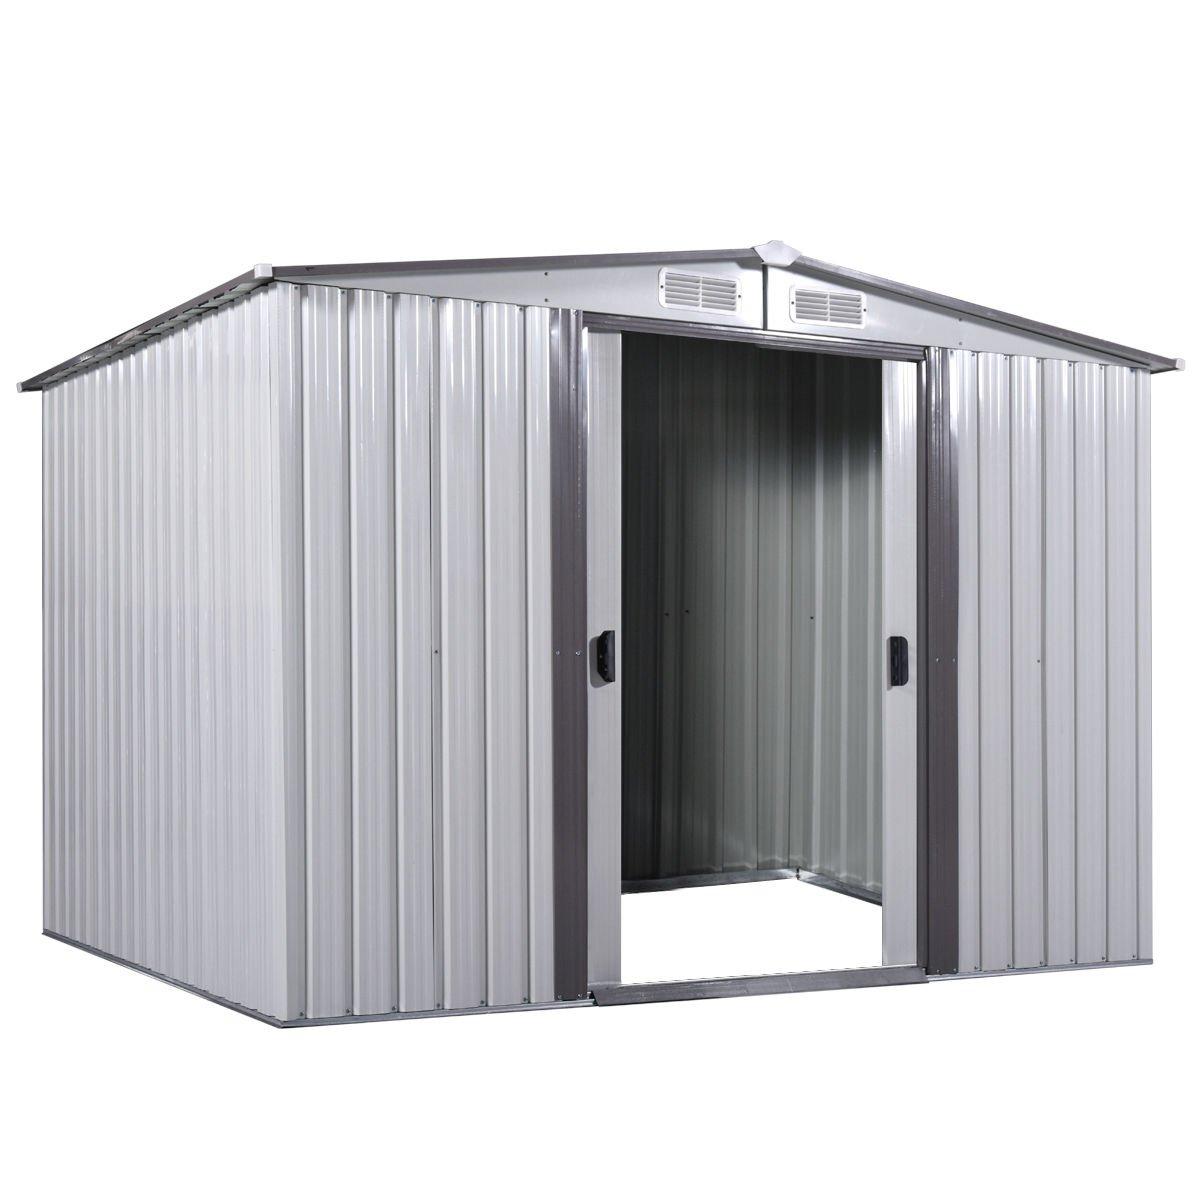 8' x 8' Outdoor Grey Steel Garden Storage Utility Tool Shed Backyard Lawn Building Garage w/Sliding Door